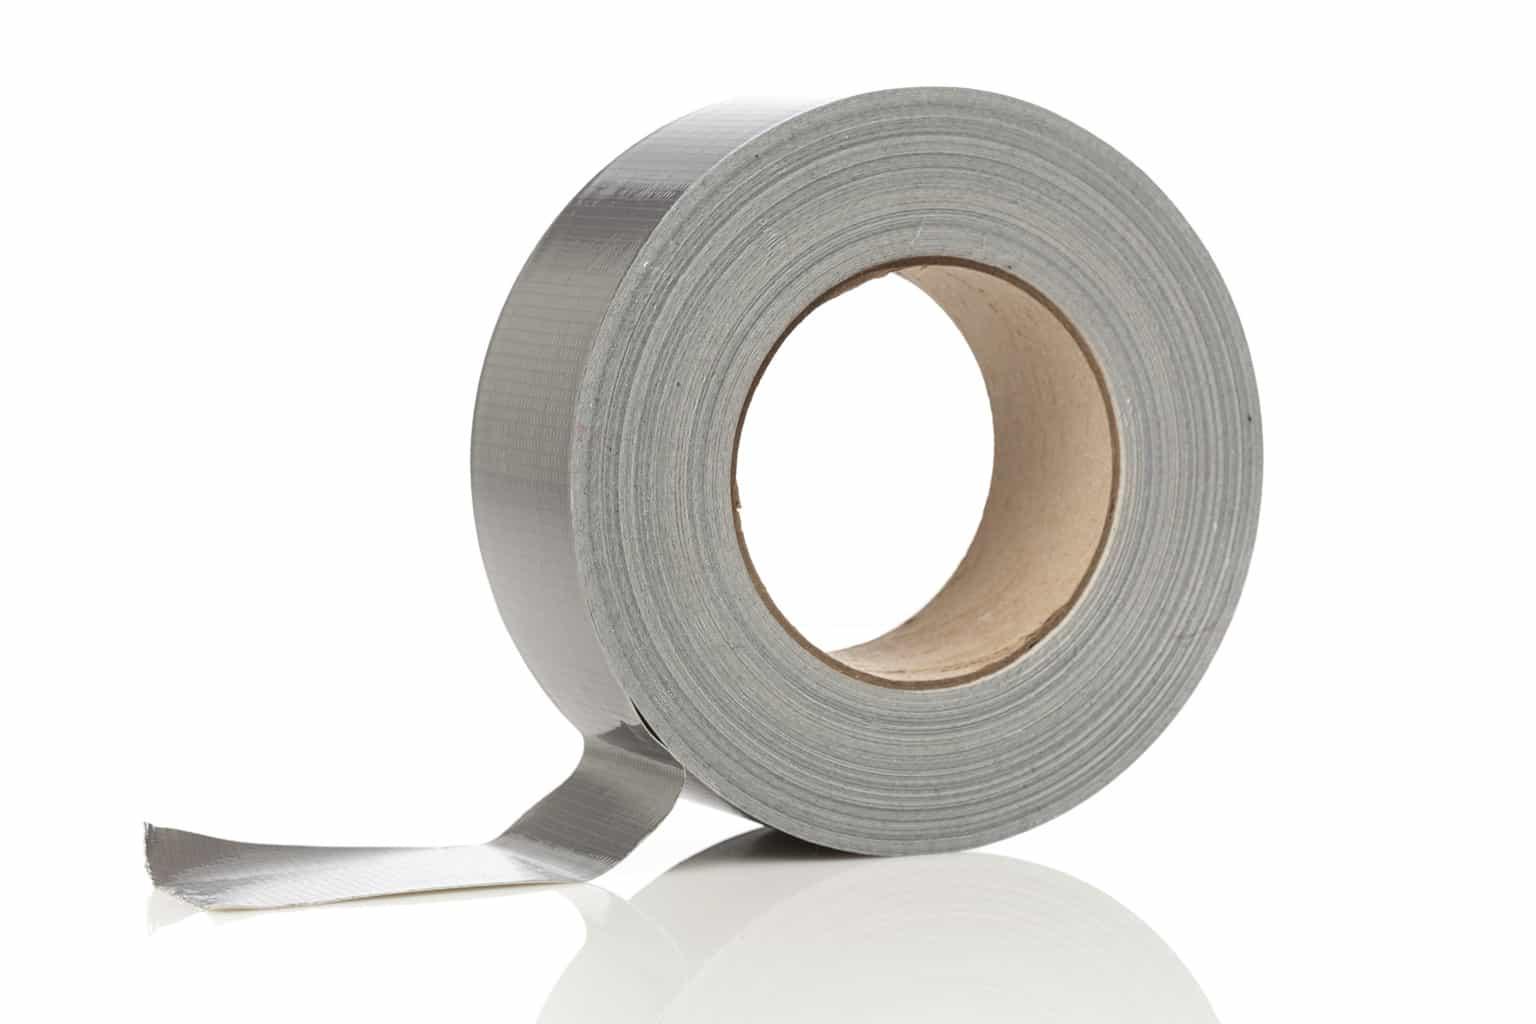 Duct tape Raft: